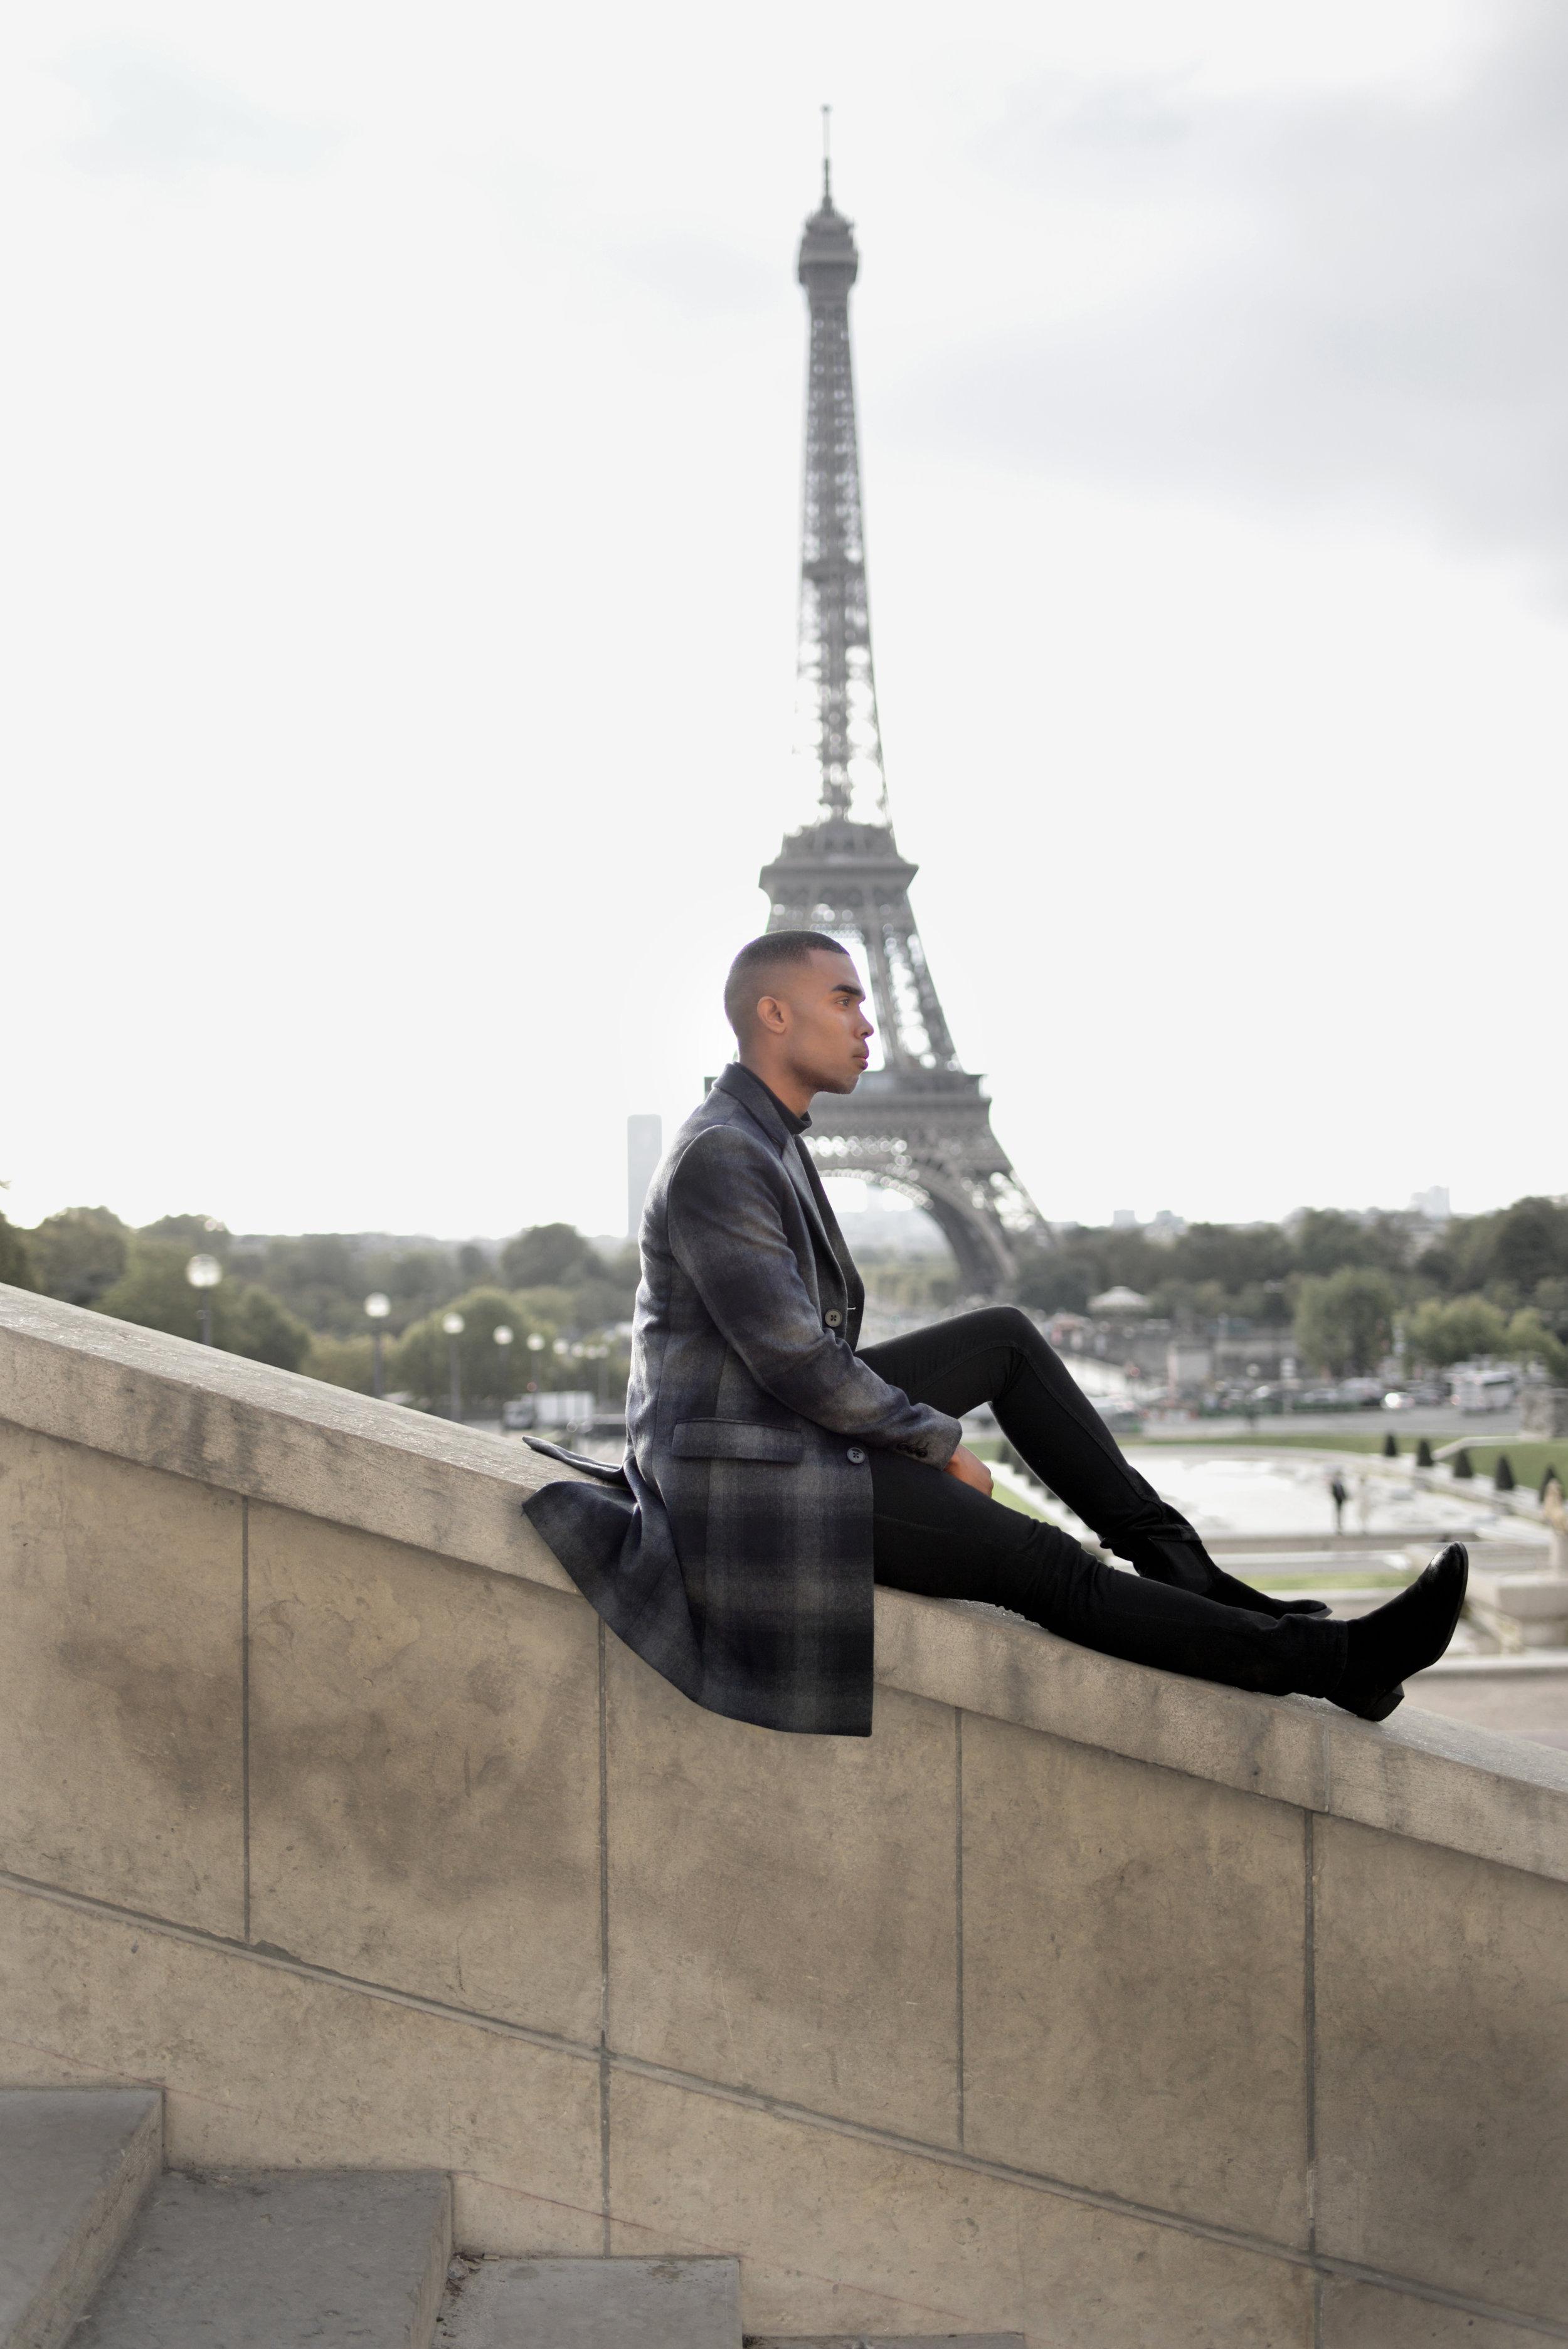 The-Look-Principle-Paris-Fashion-Week-Part2-3.jpg